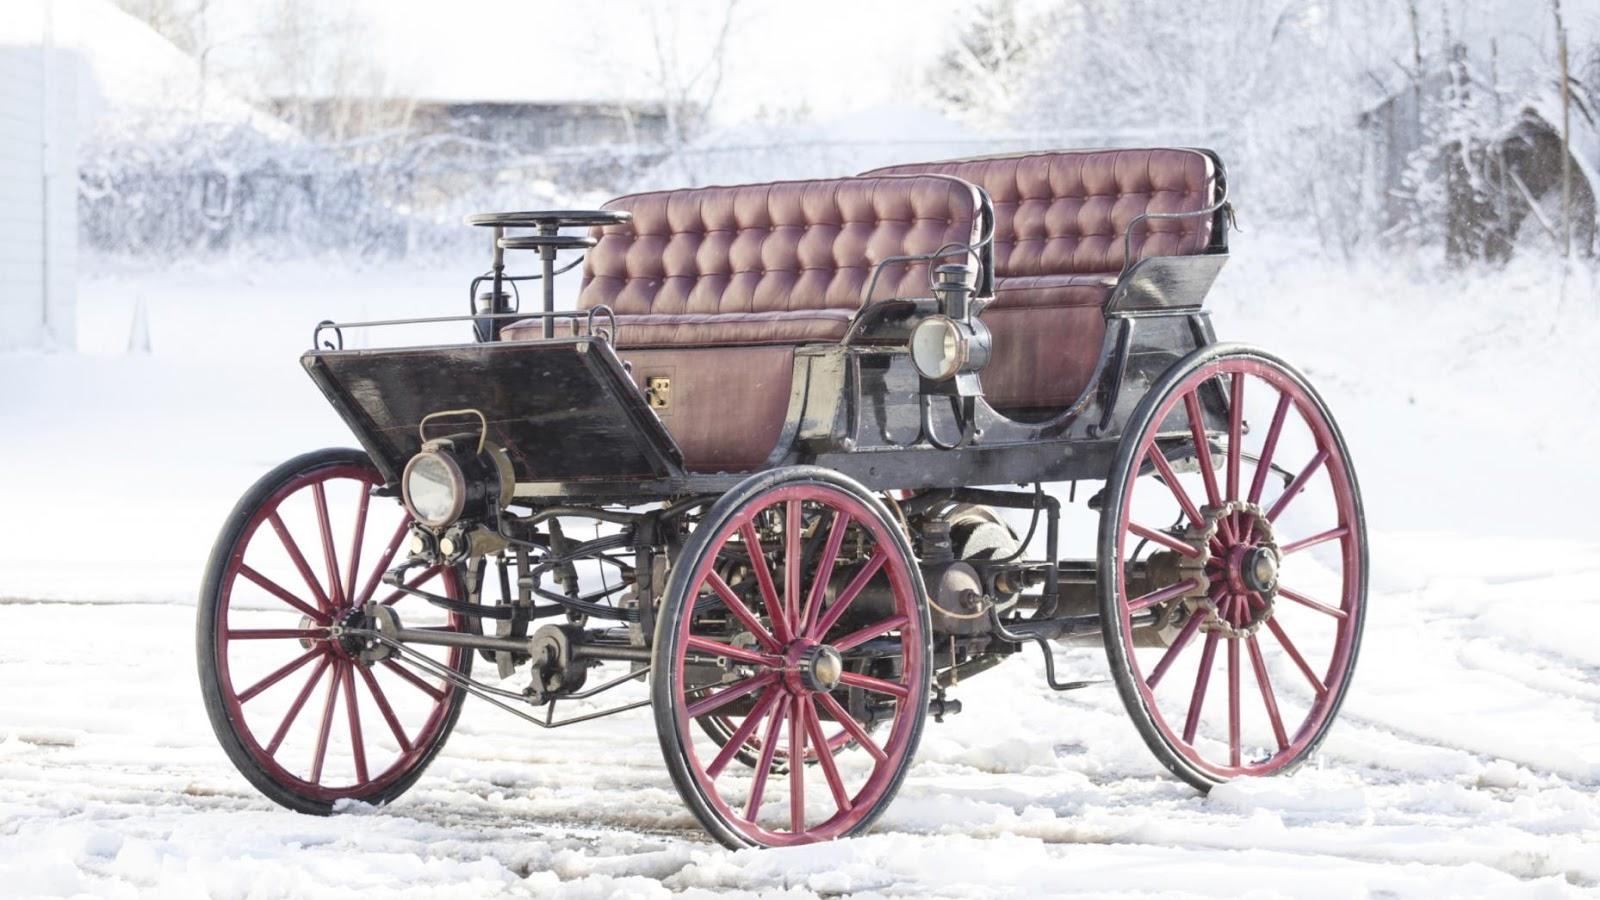 1896 Armstrong Phaeton Gasoline Electric Hybrid: $483,400